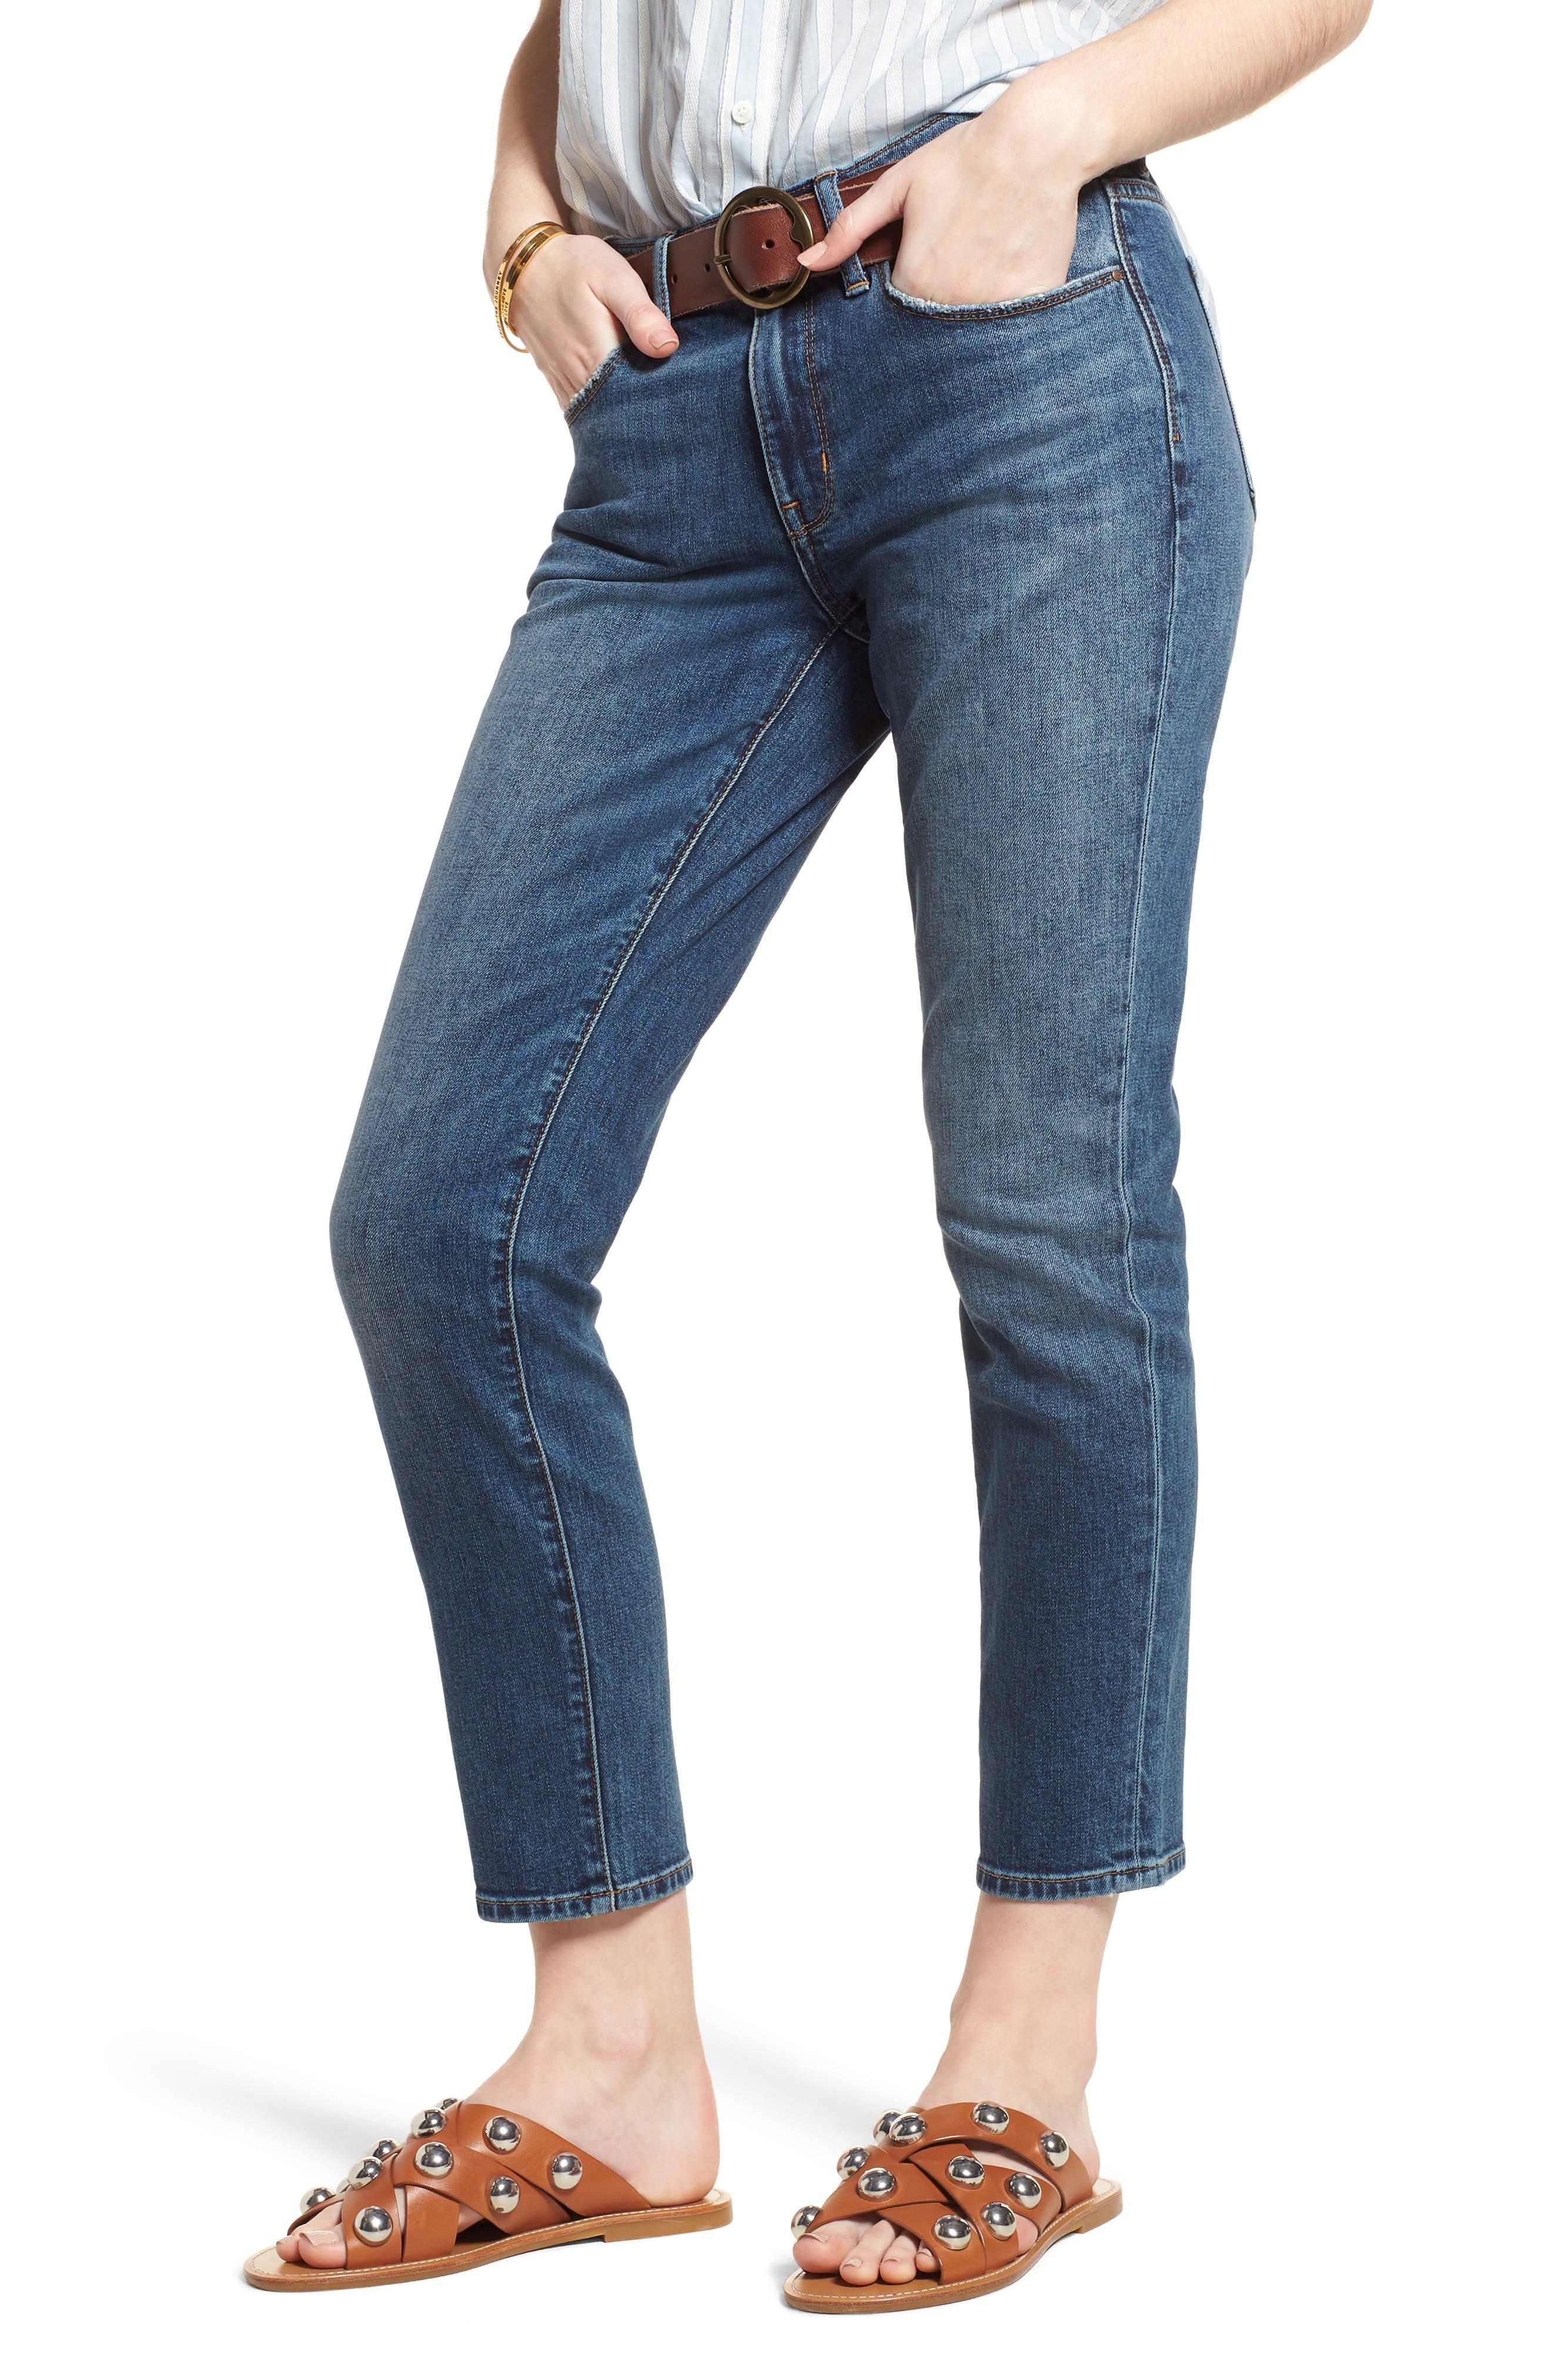 Alternate Image 1 Selected - Treasure & Bond Grant Ankle Boyfriend Jeans (Gravel Dusk Vintage)